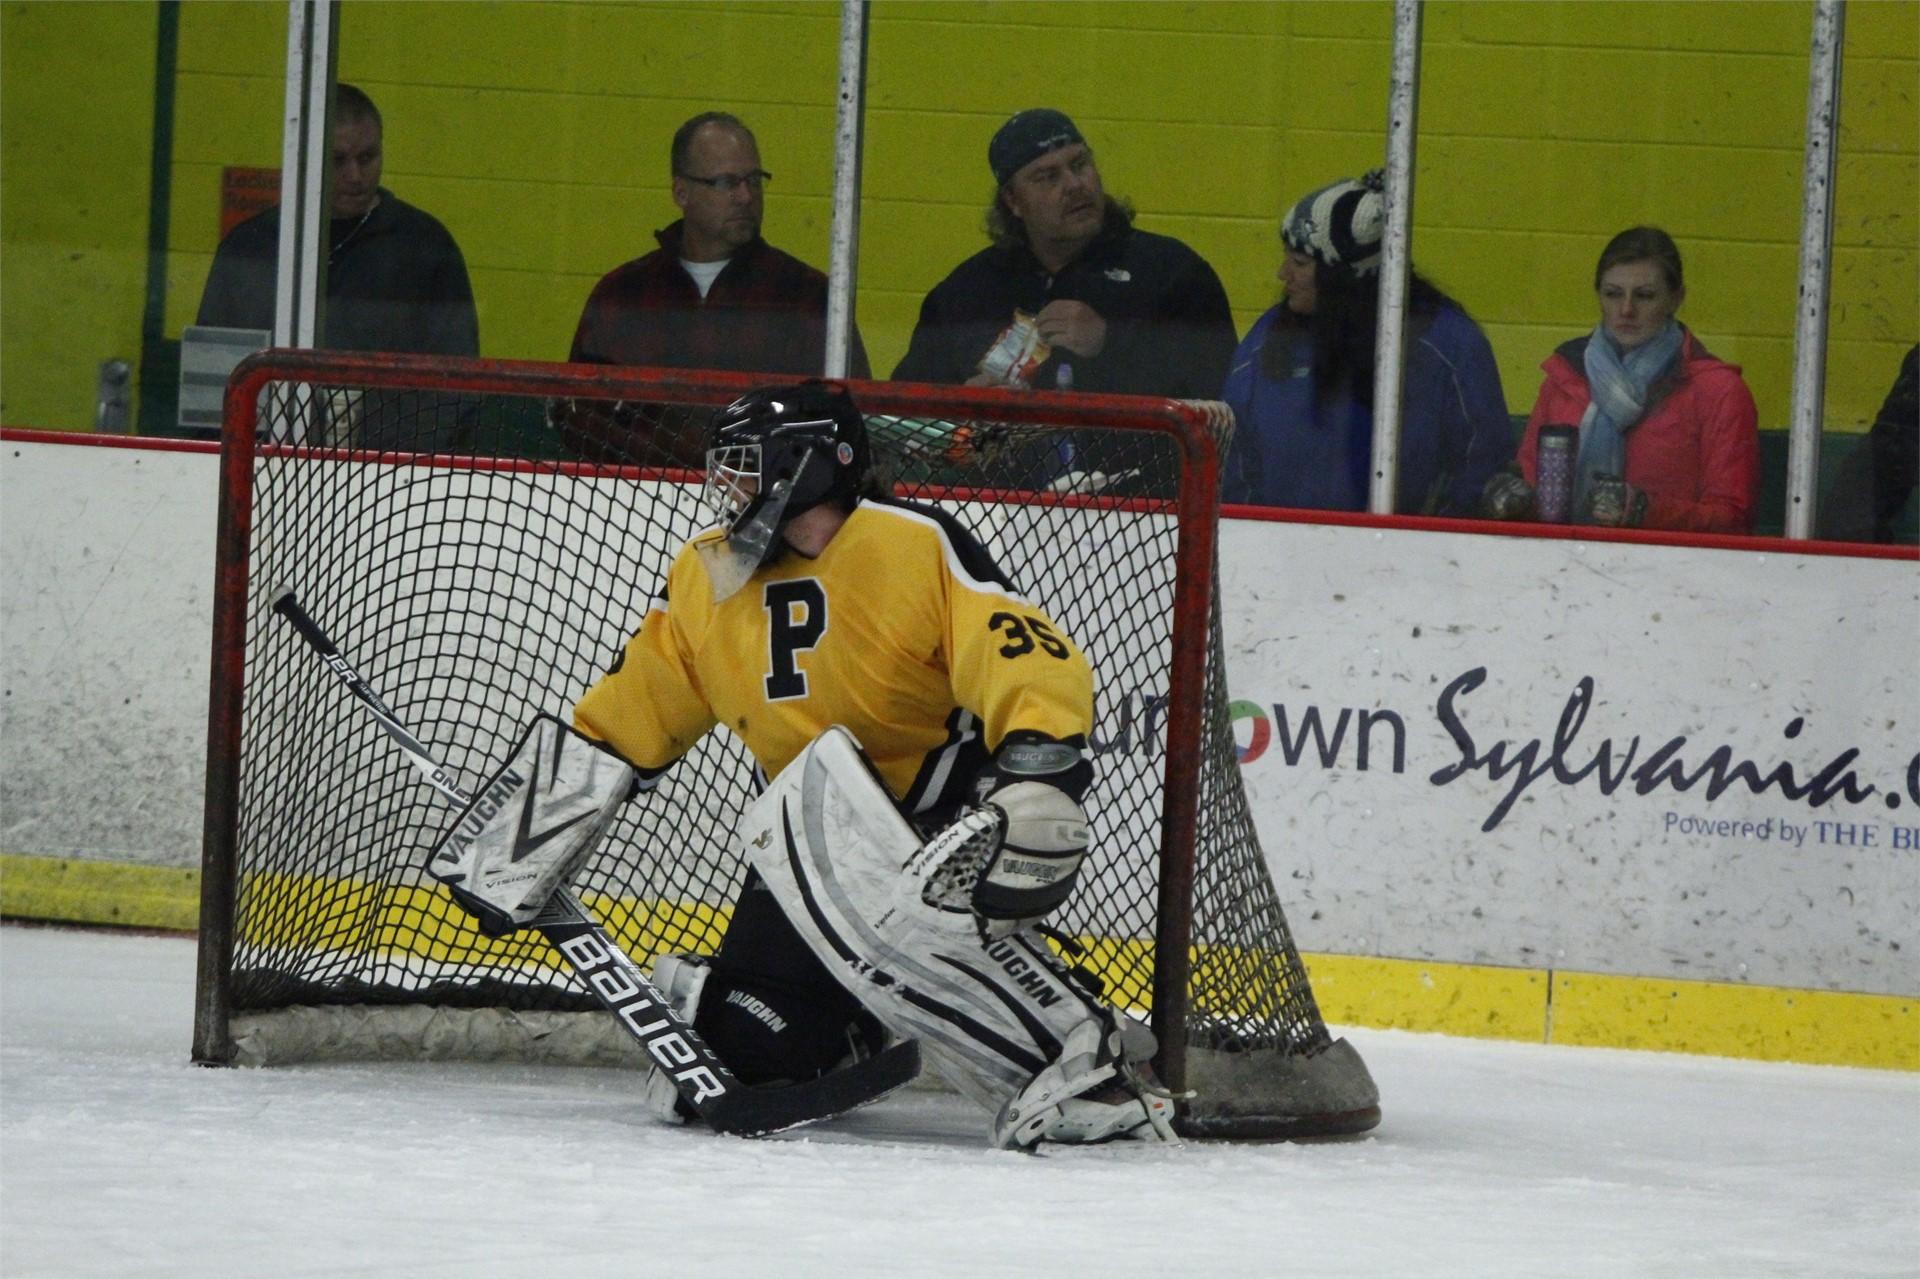 PHS student athlete playing goalie